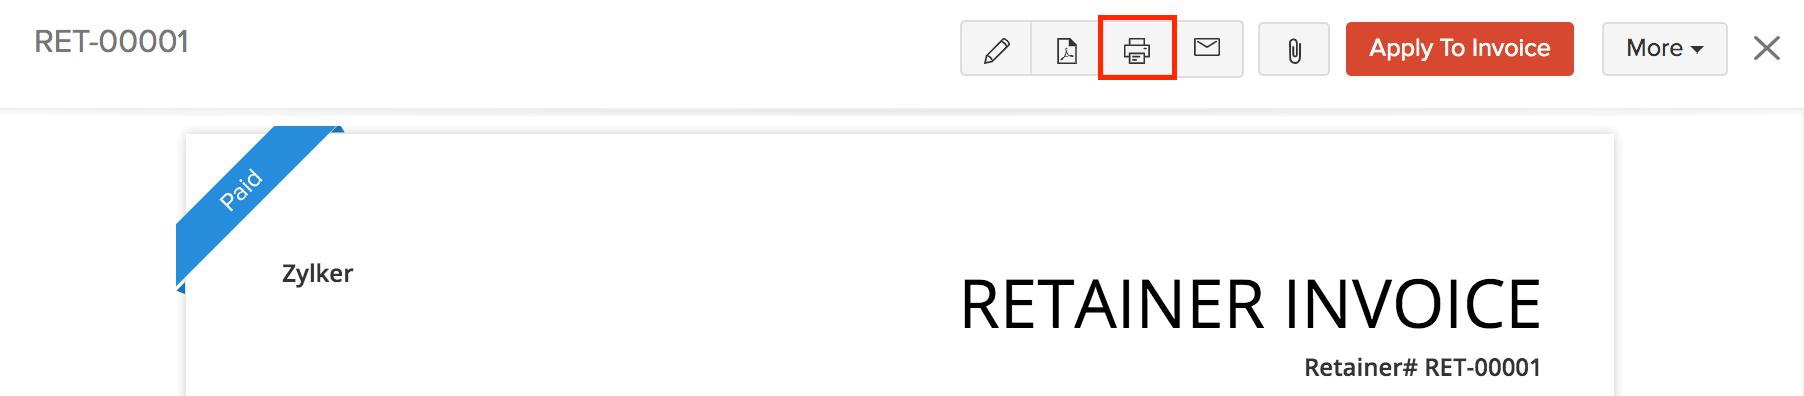 Print Retainer Invoice